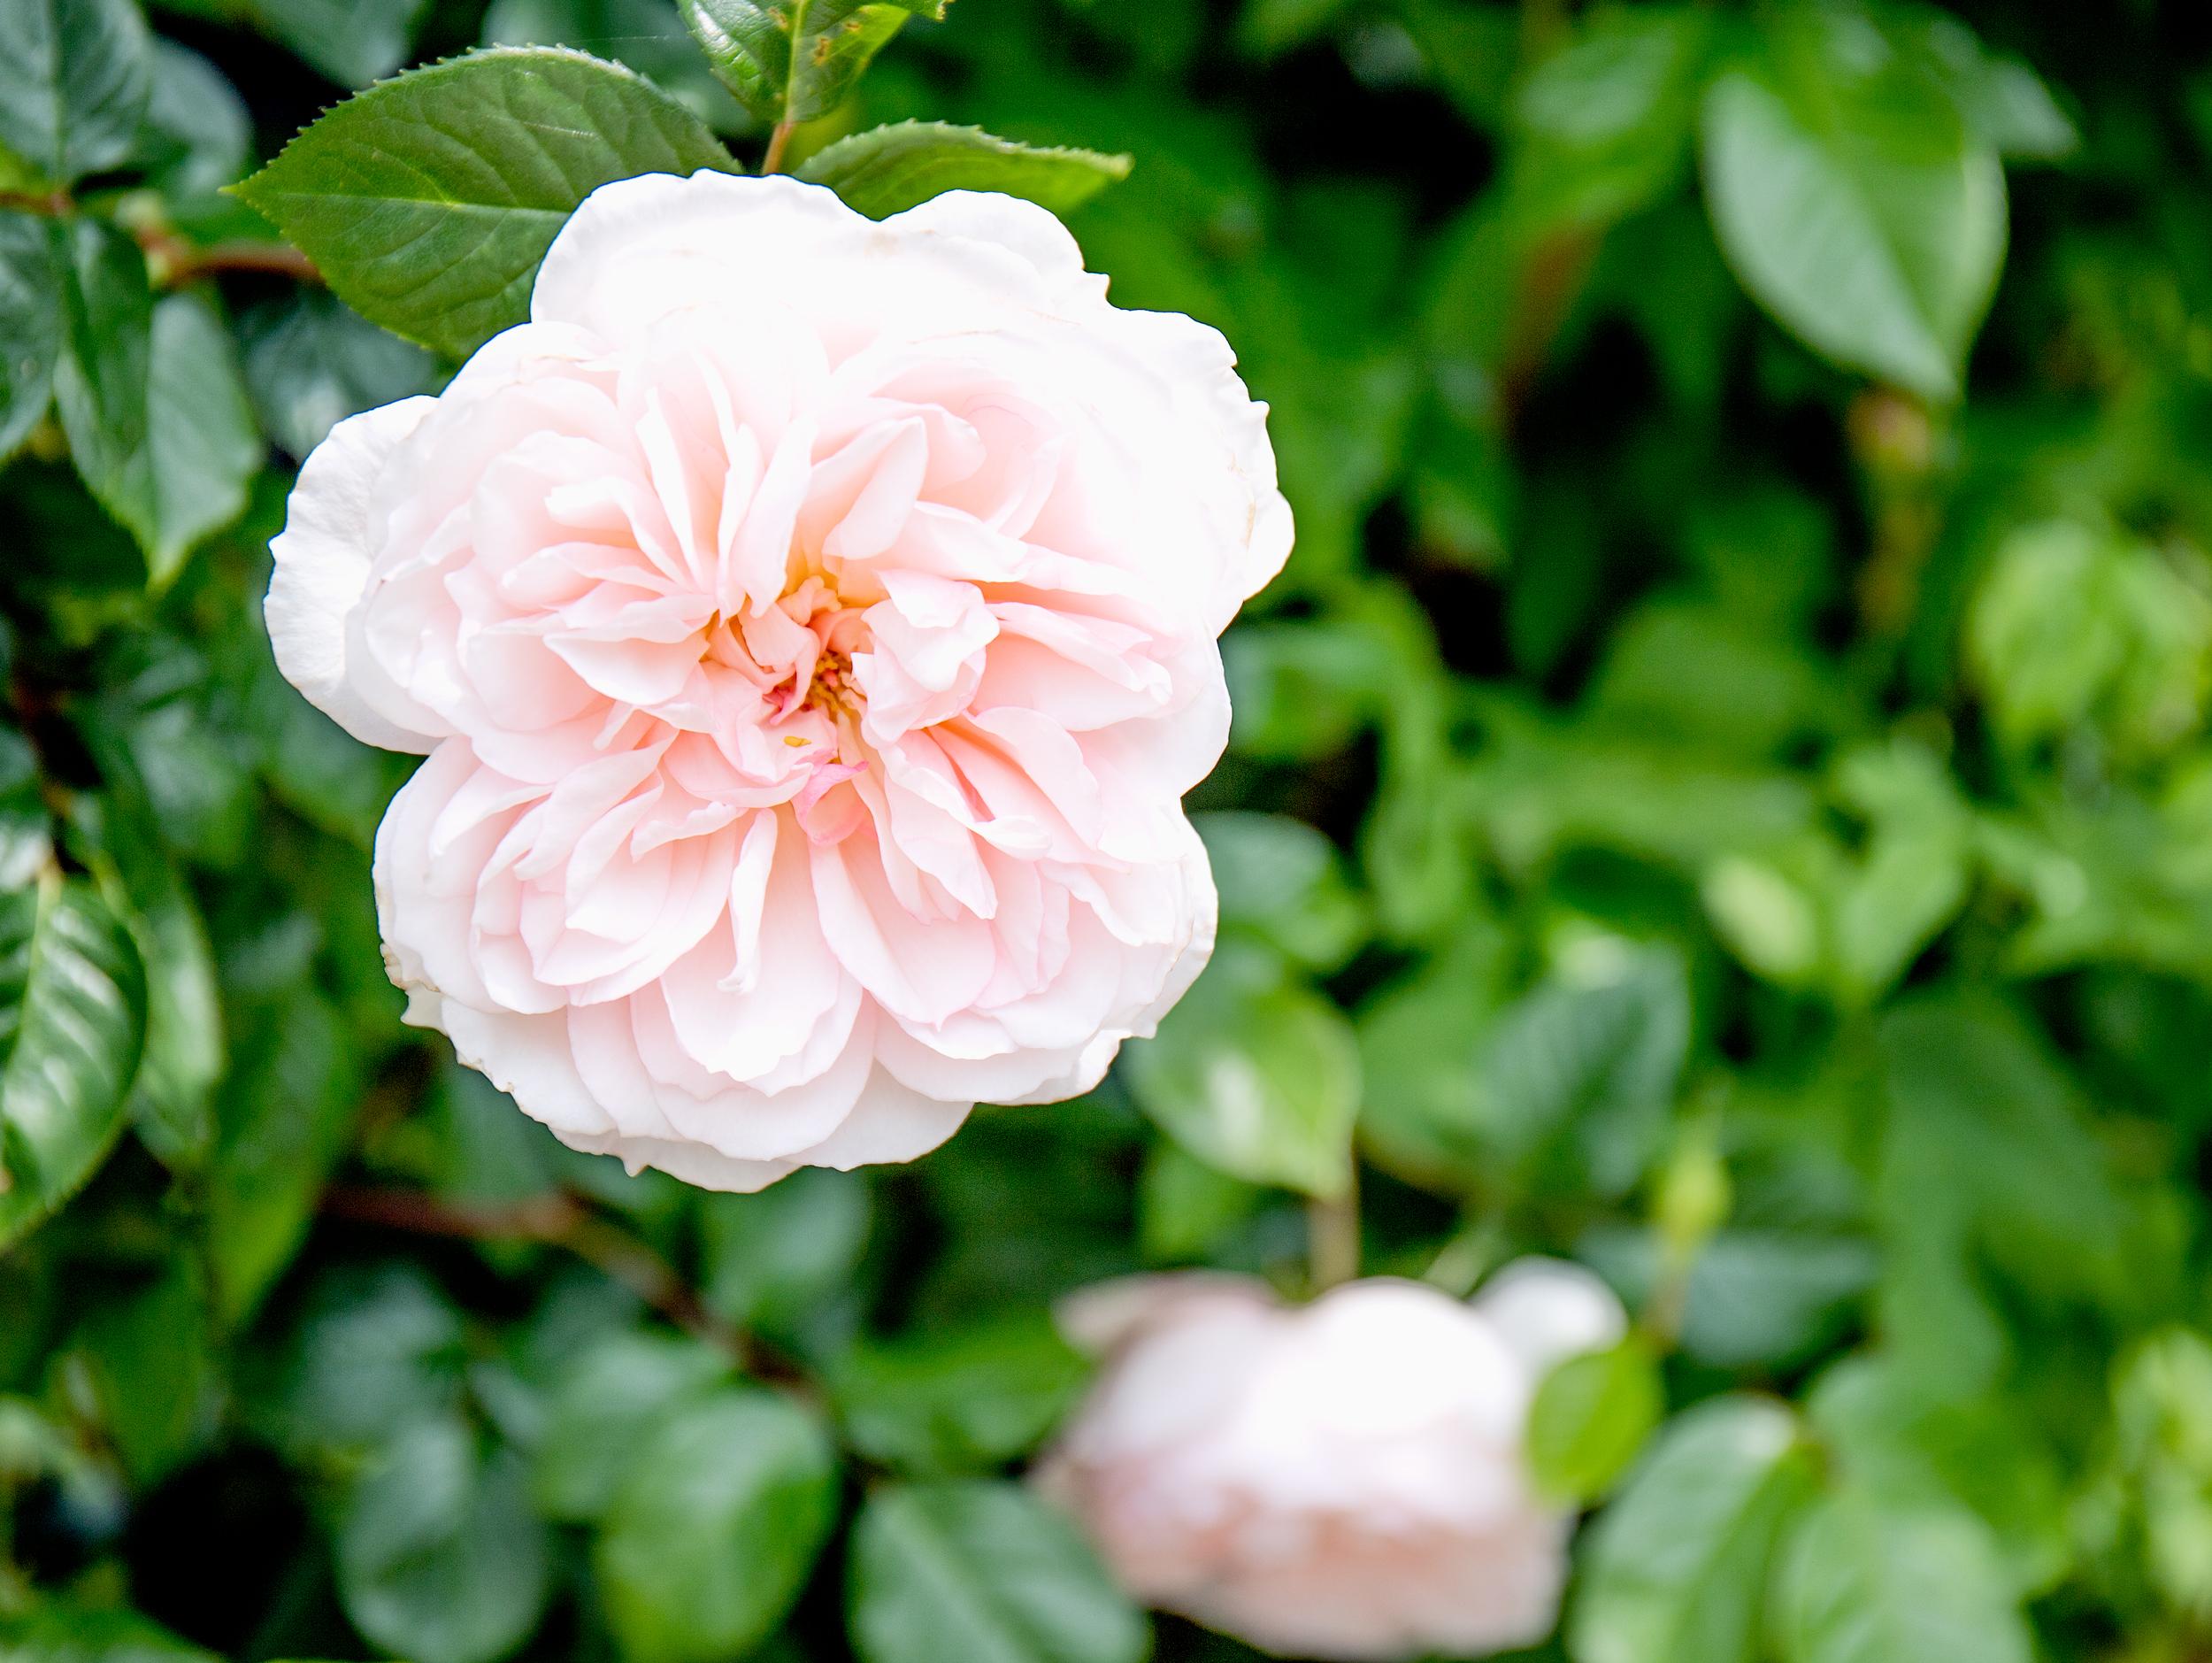 Rose_8176.jpg